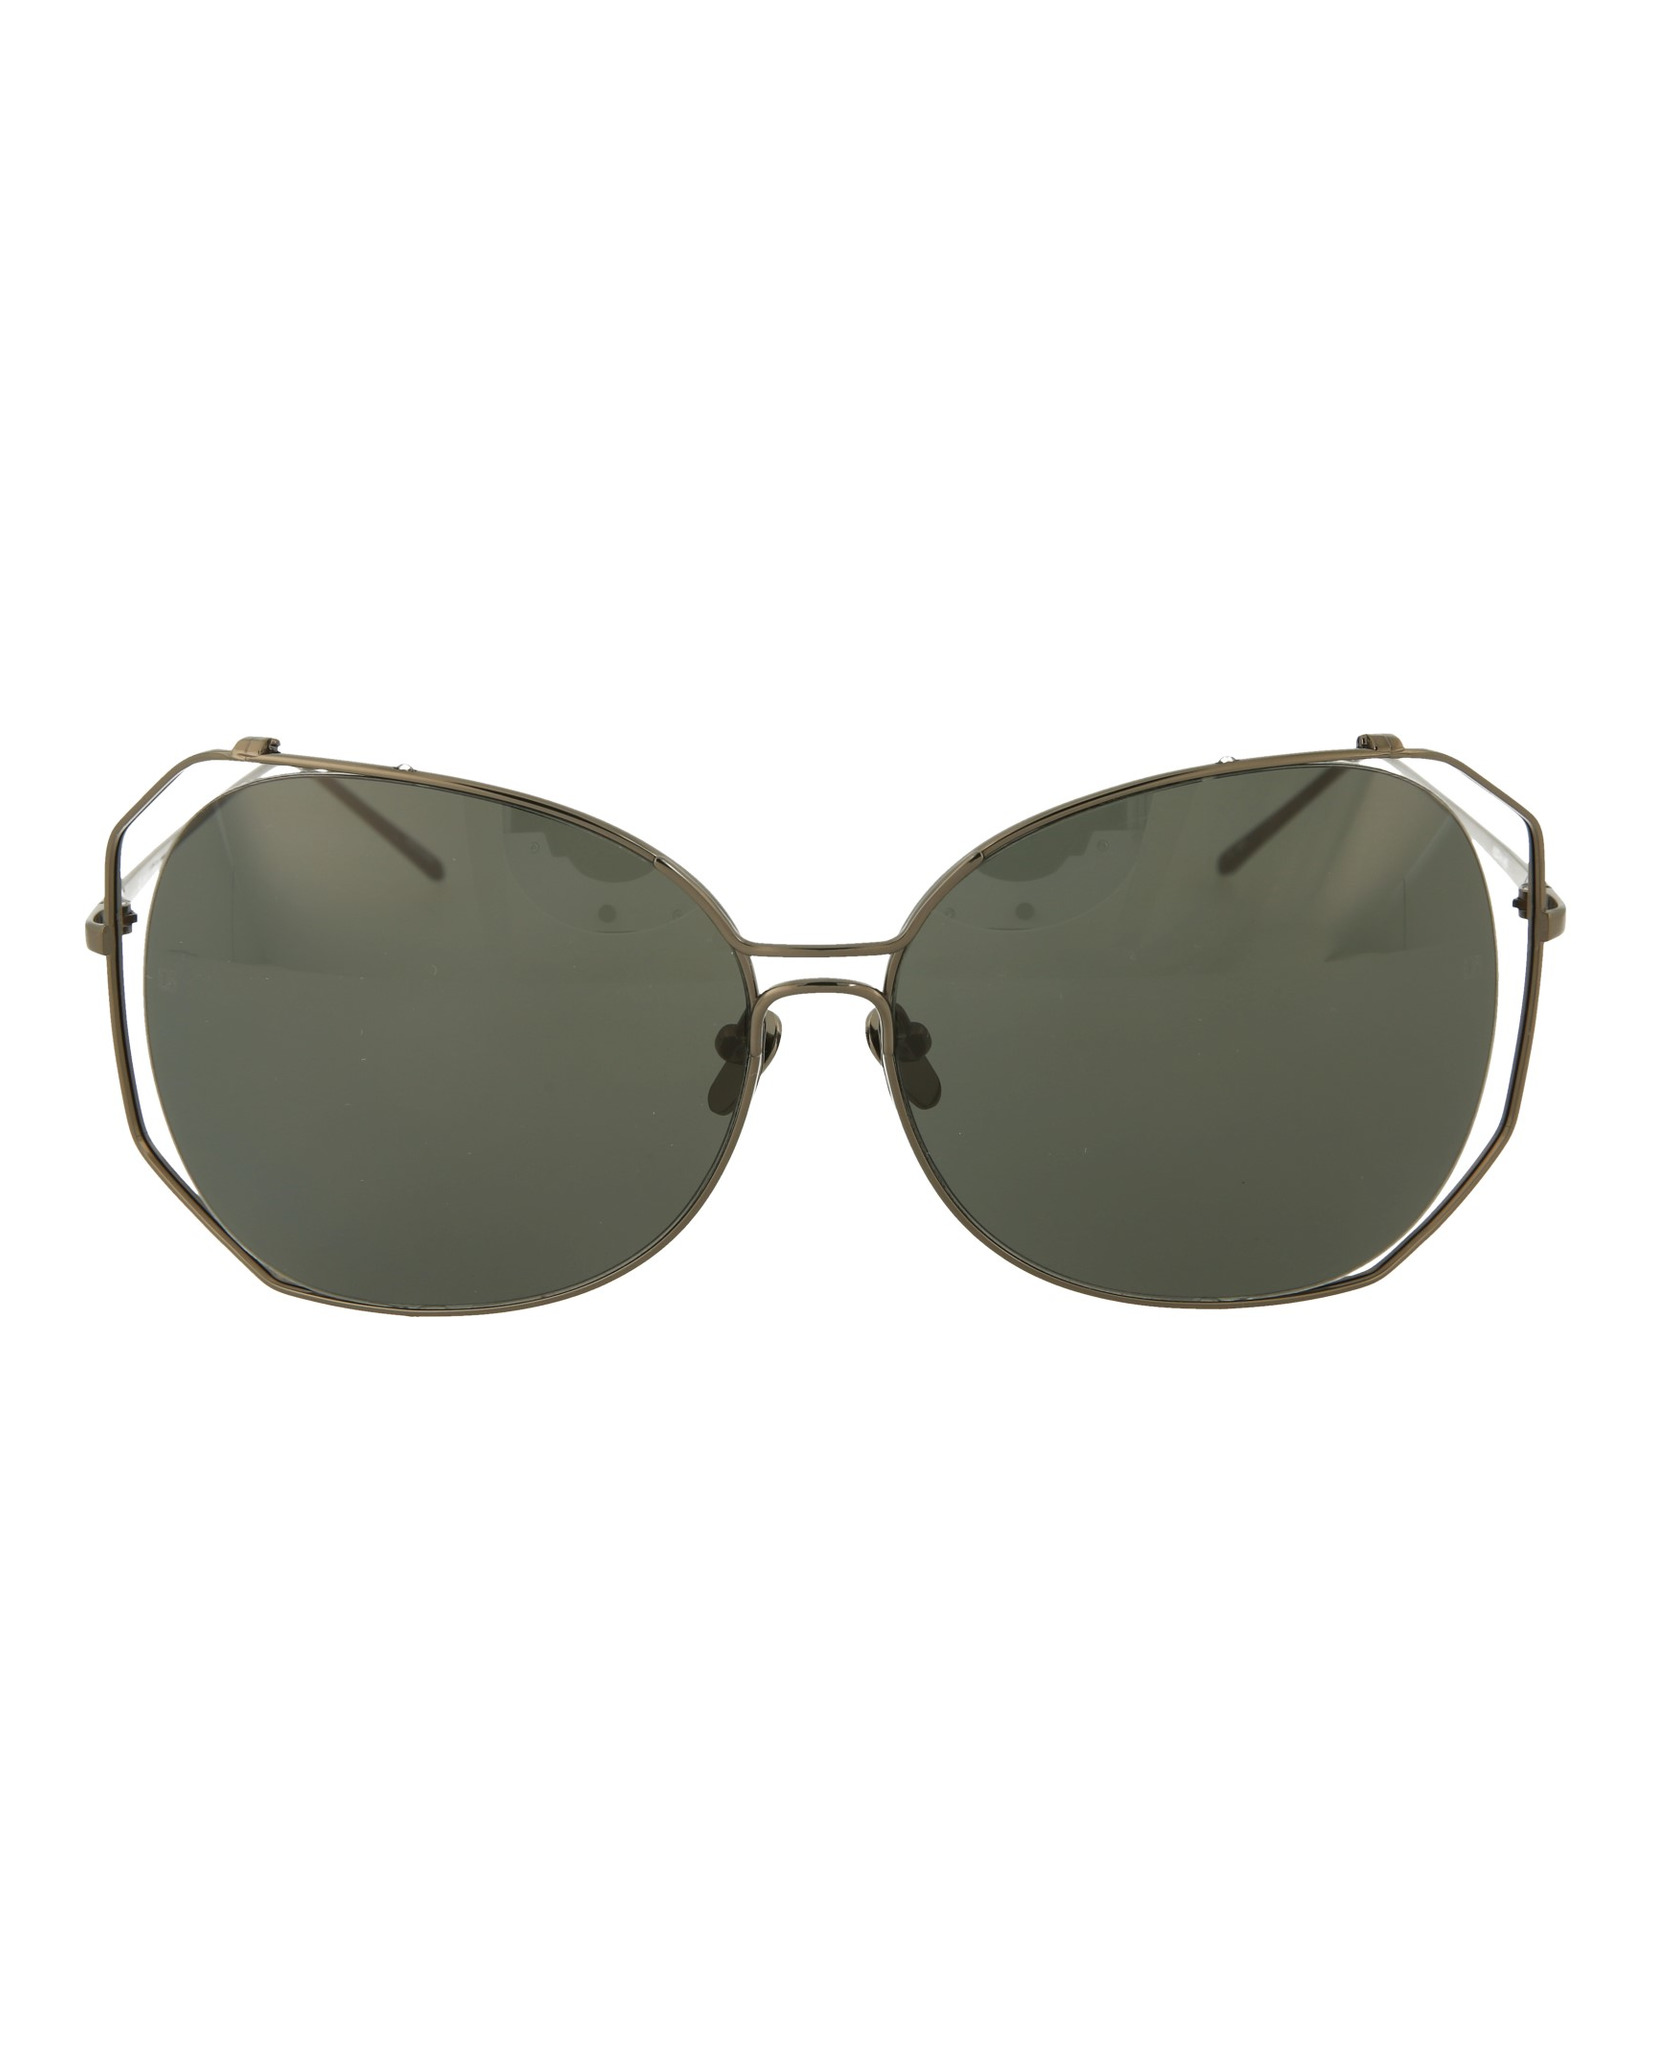 486578e706 Linda Farrow Womens Aviator Sunglasses LFL399C4-SUN 191966088376